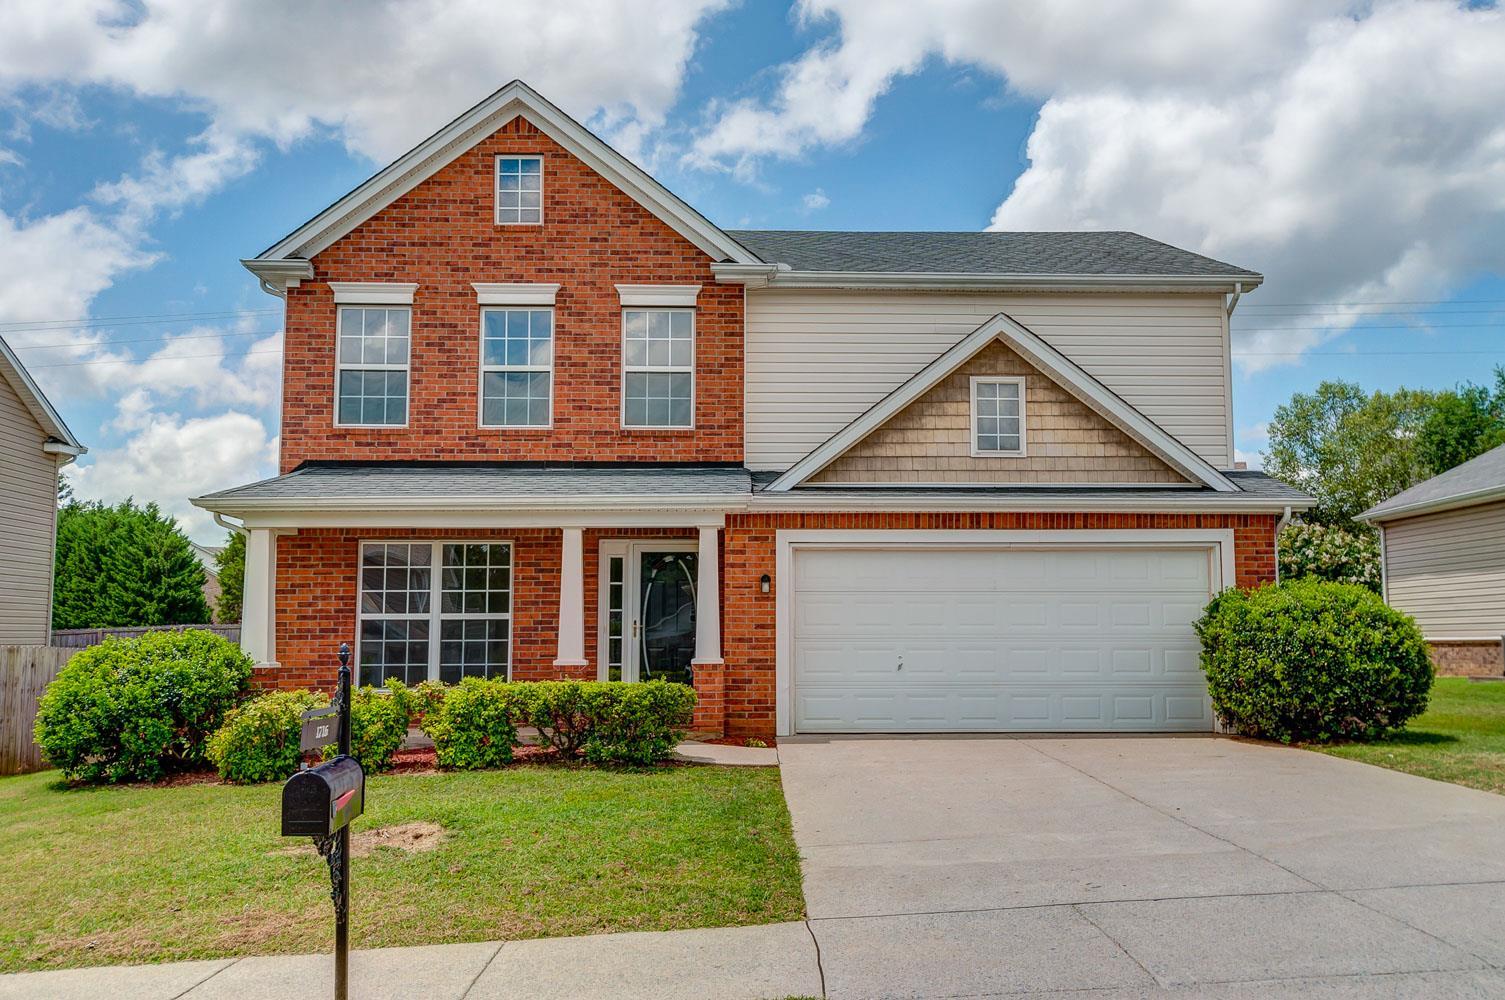 1716 Emma Cir, Spring Hill, TN 37174 - Spring Hill, TN real estate listing